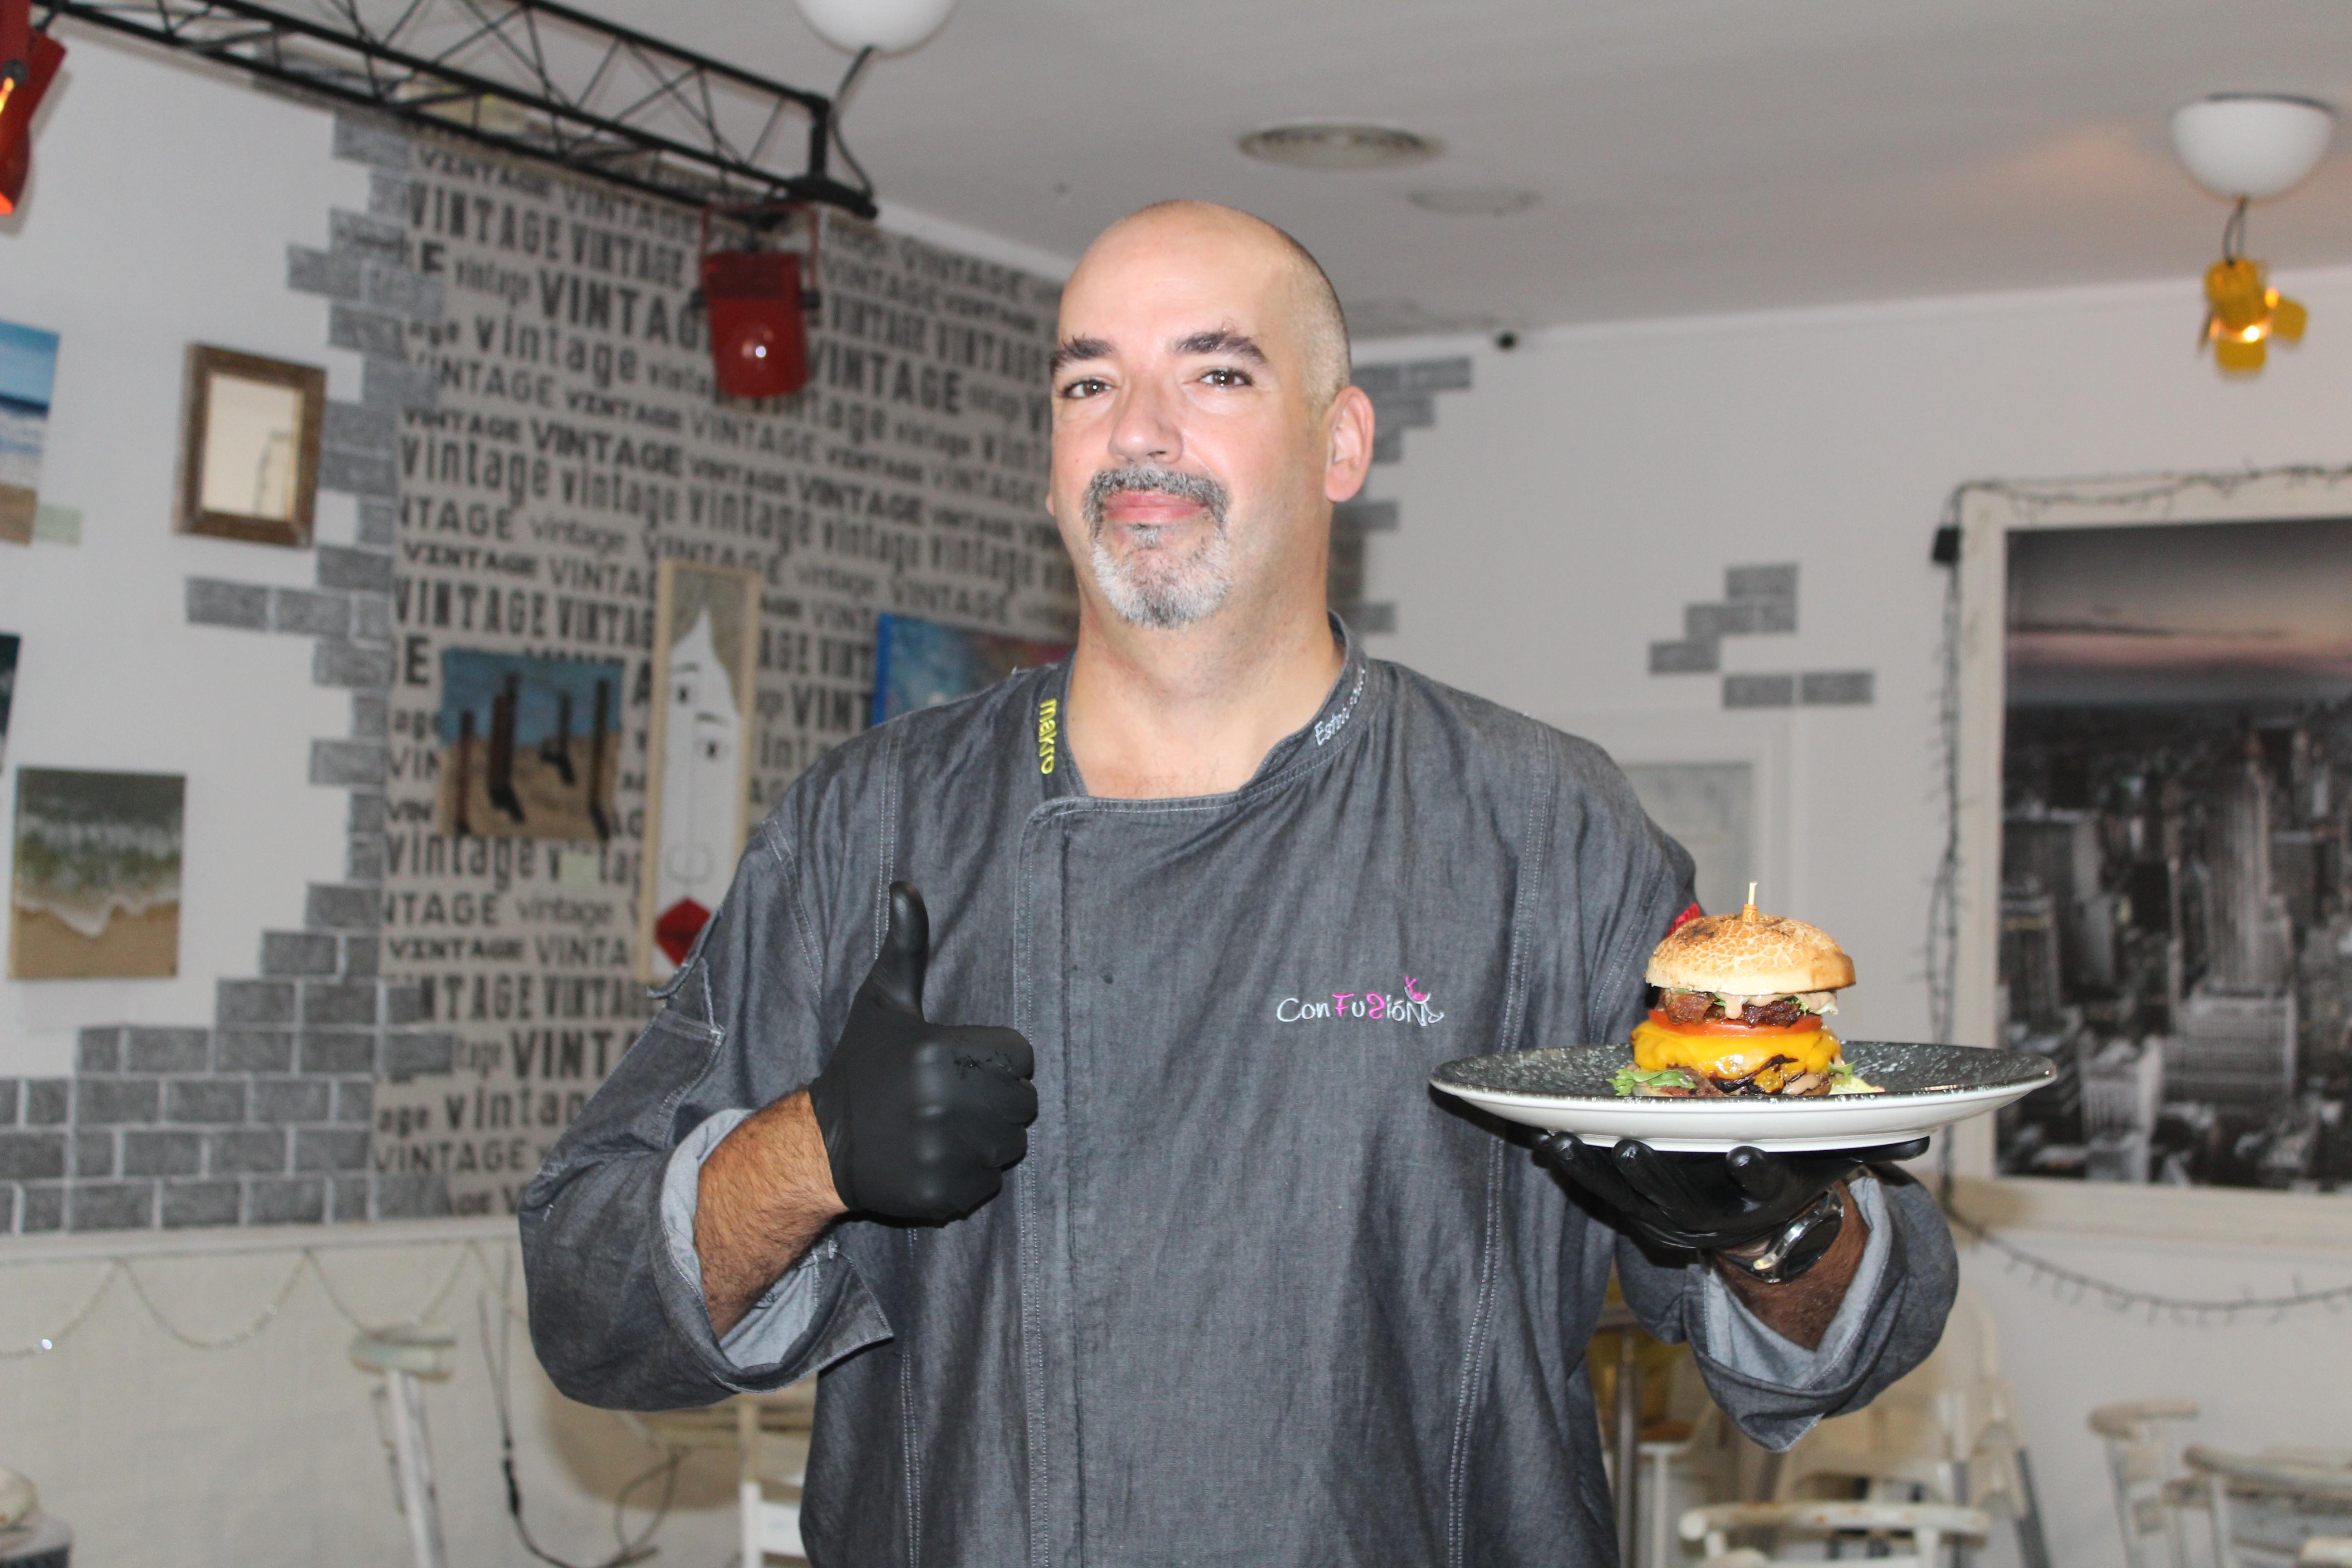 La hamburguesa gourmet de Esteban Sedeño lucha por ser la mejor de España